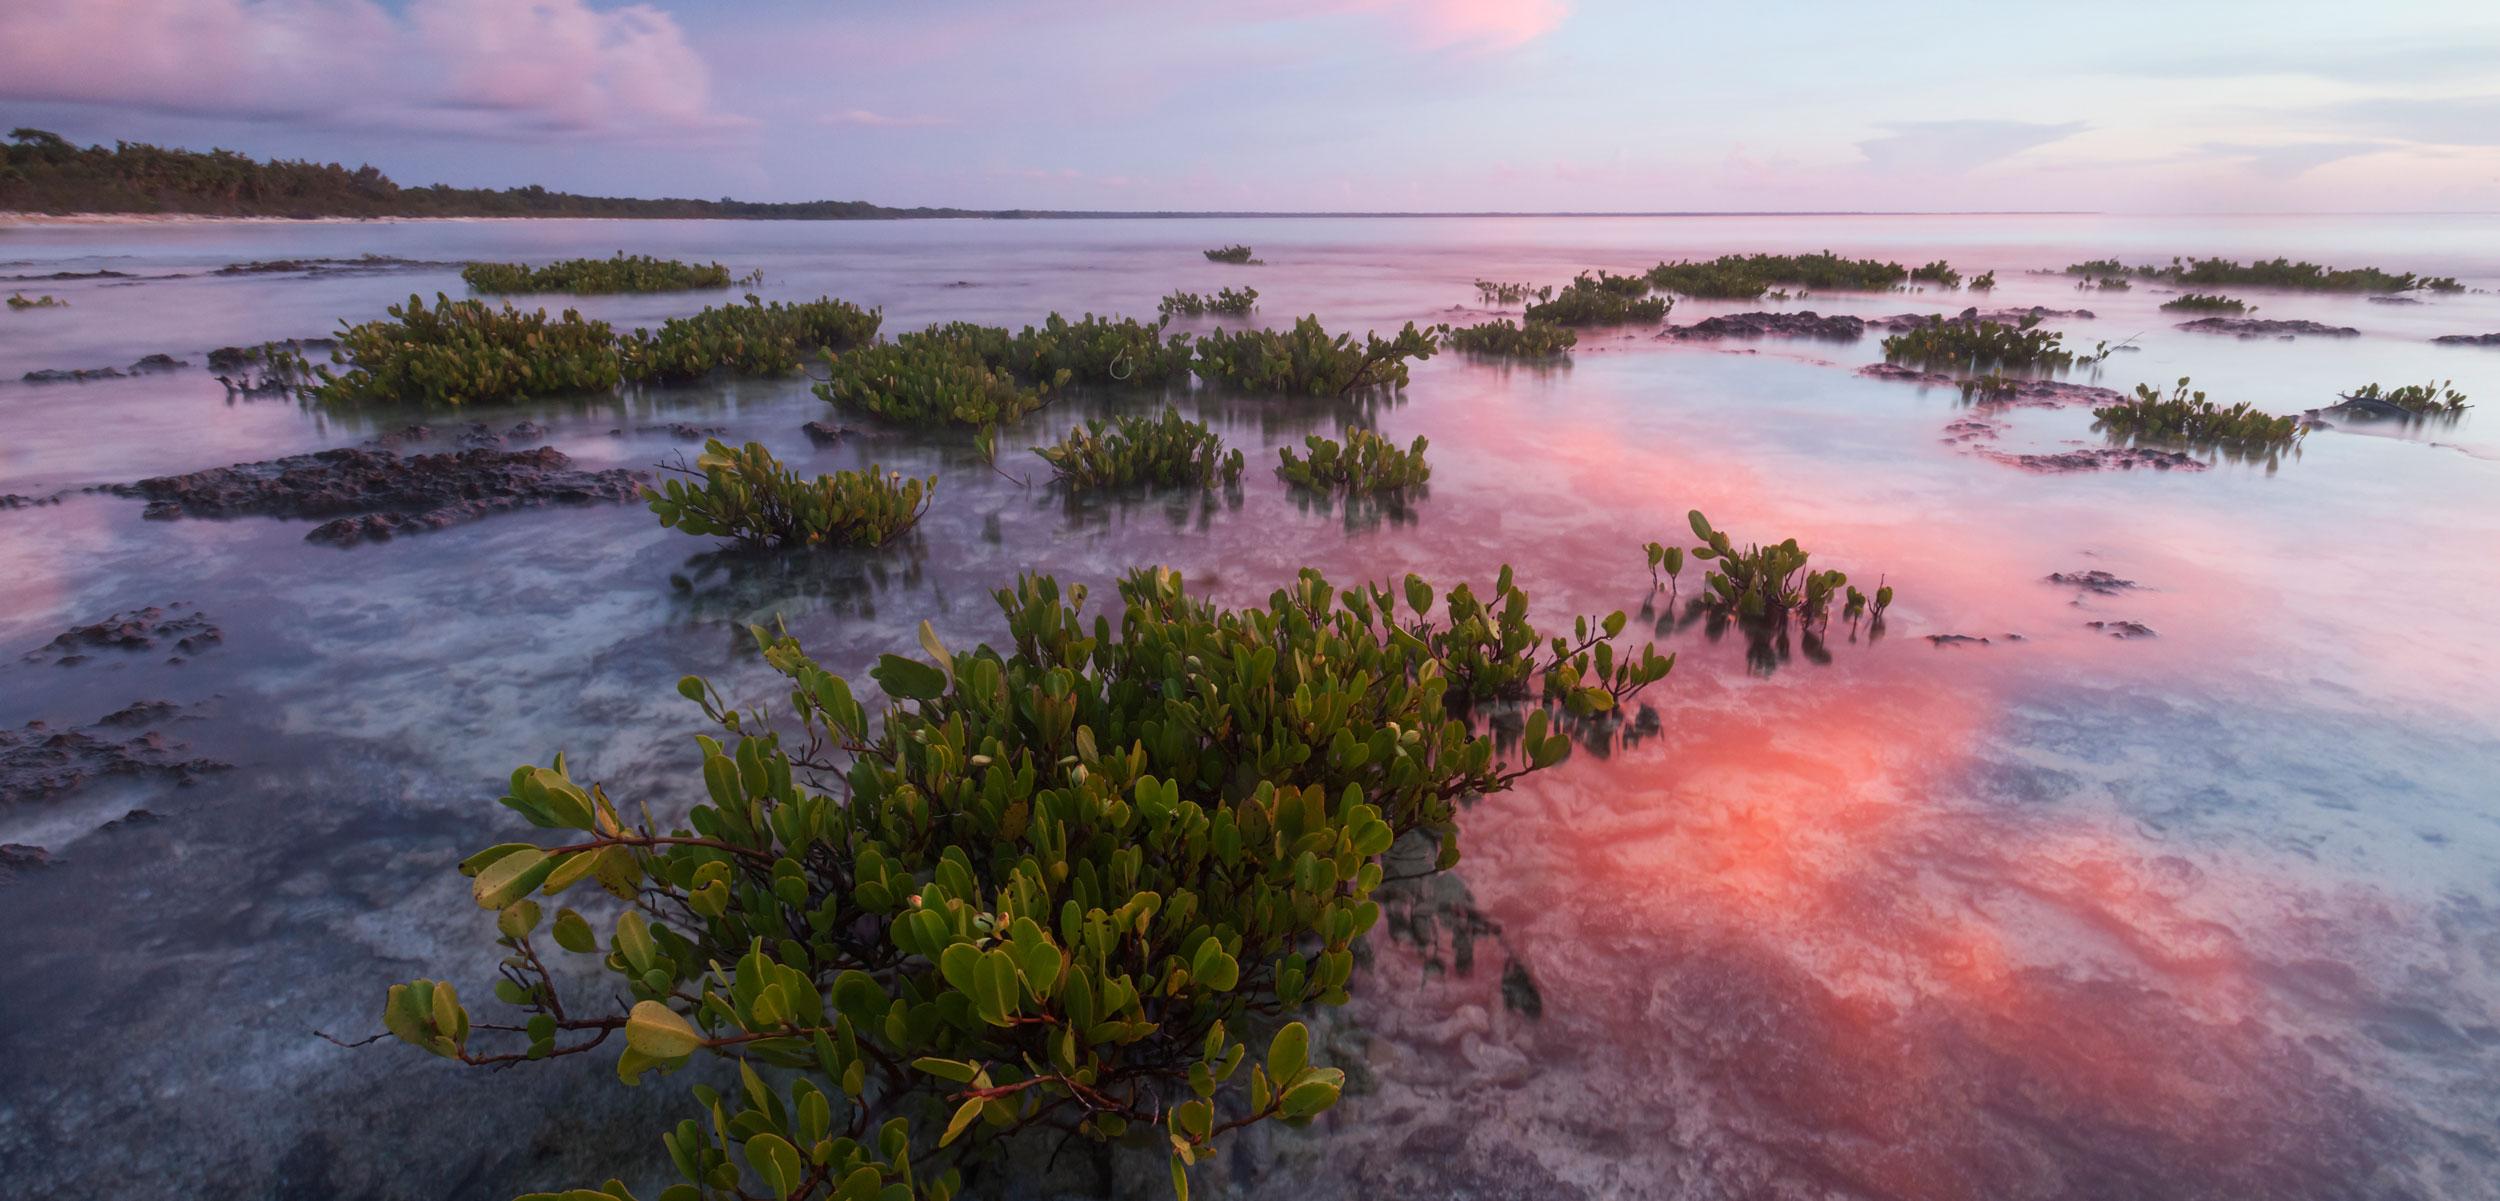 Red mangrove (Rhizophora mangle), tree seedllings at sunset, Guanahacabibes Peninsula National Park